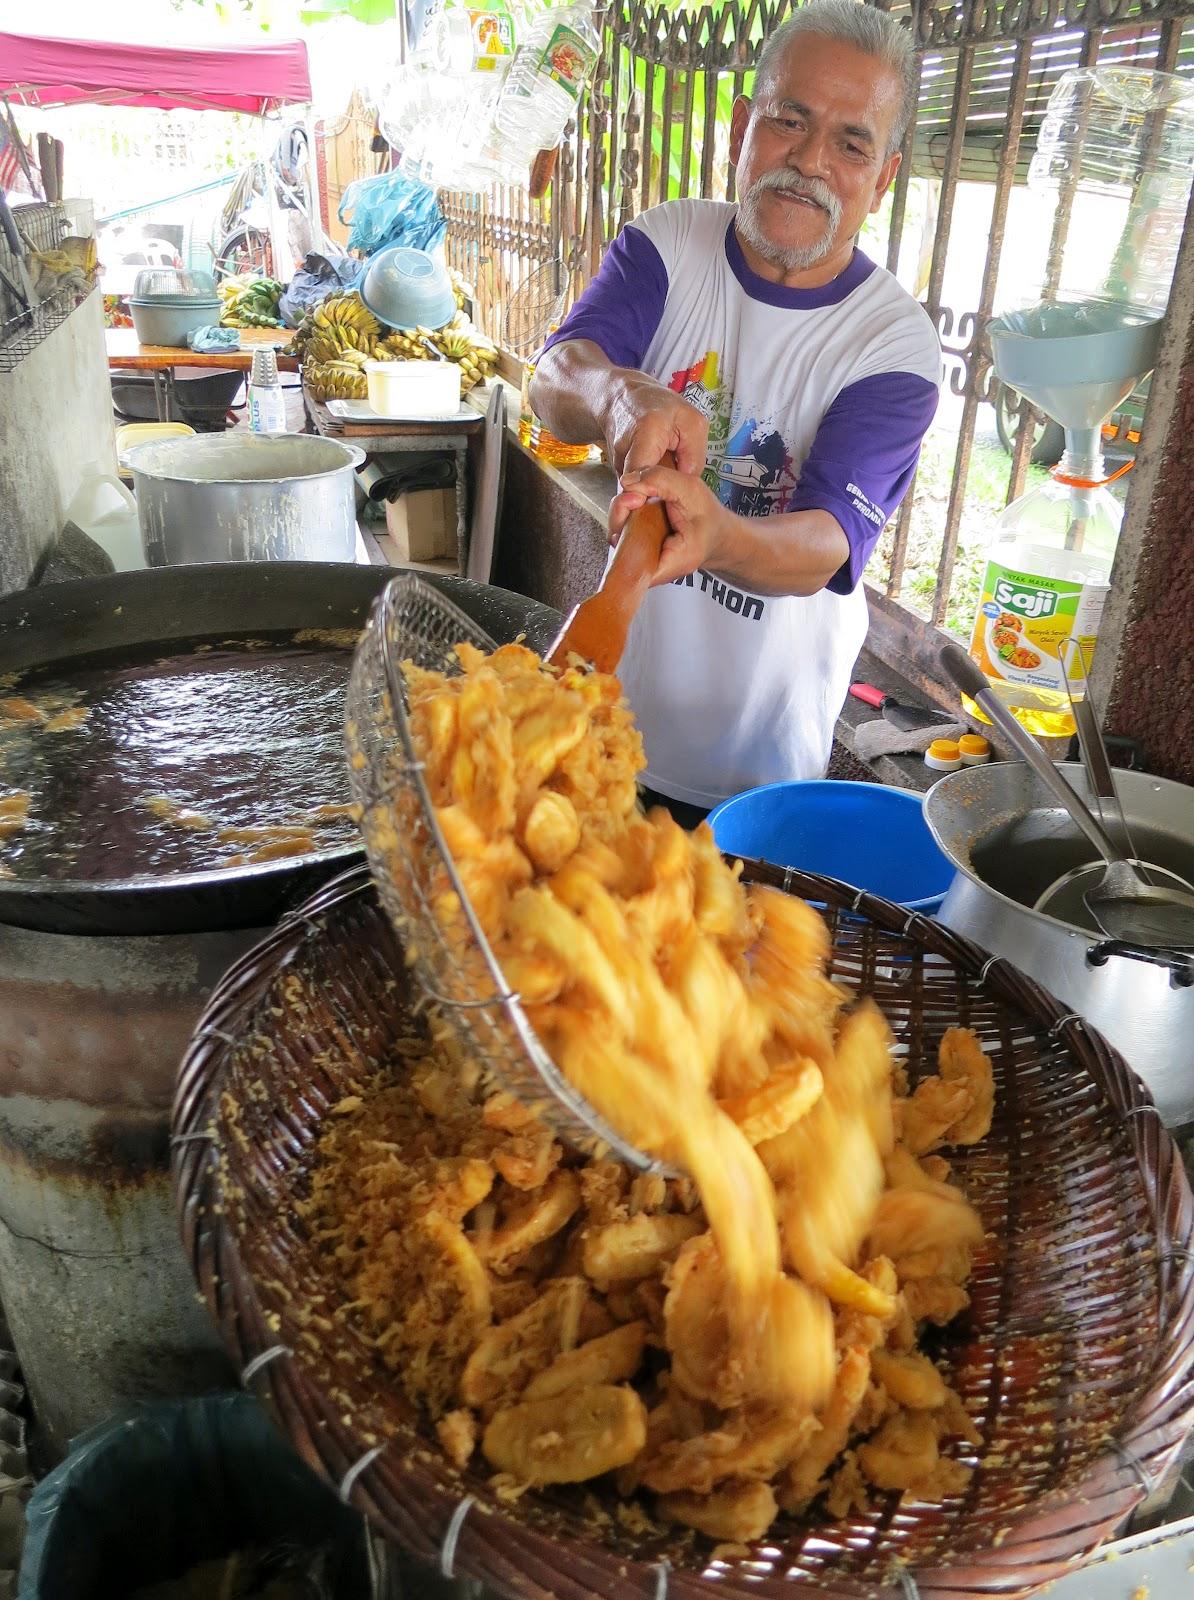 Food We Love - Pisang Goreng (Fried Bananas)  Johor Kaki Travels for Food